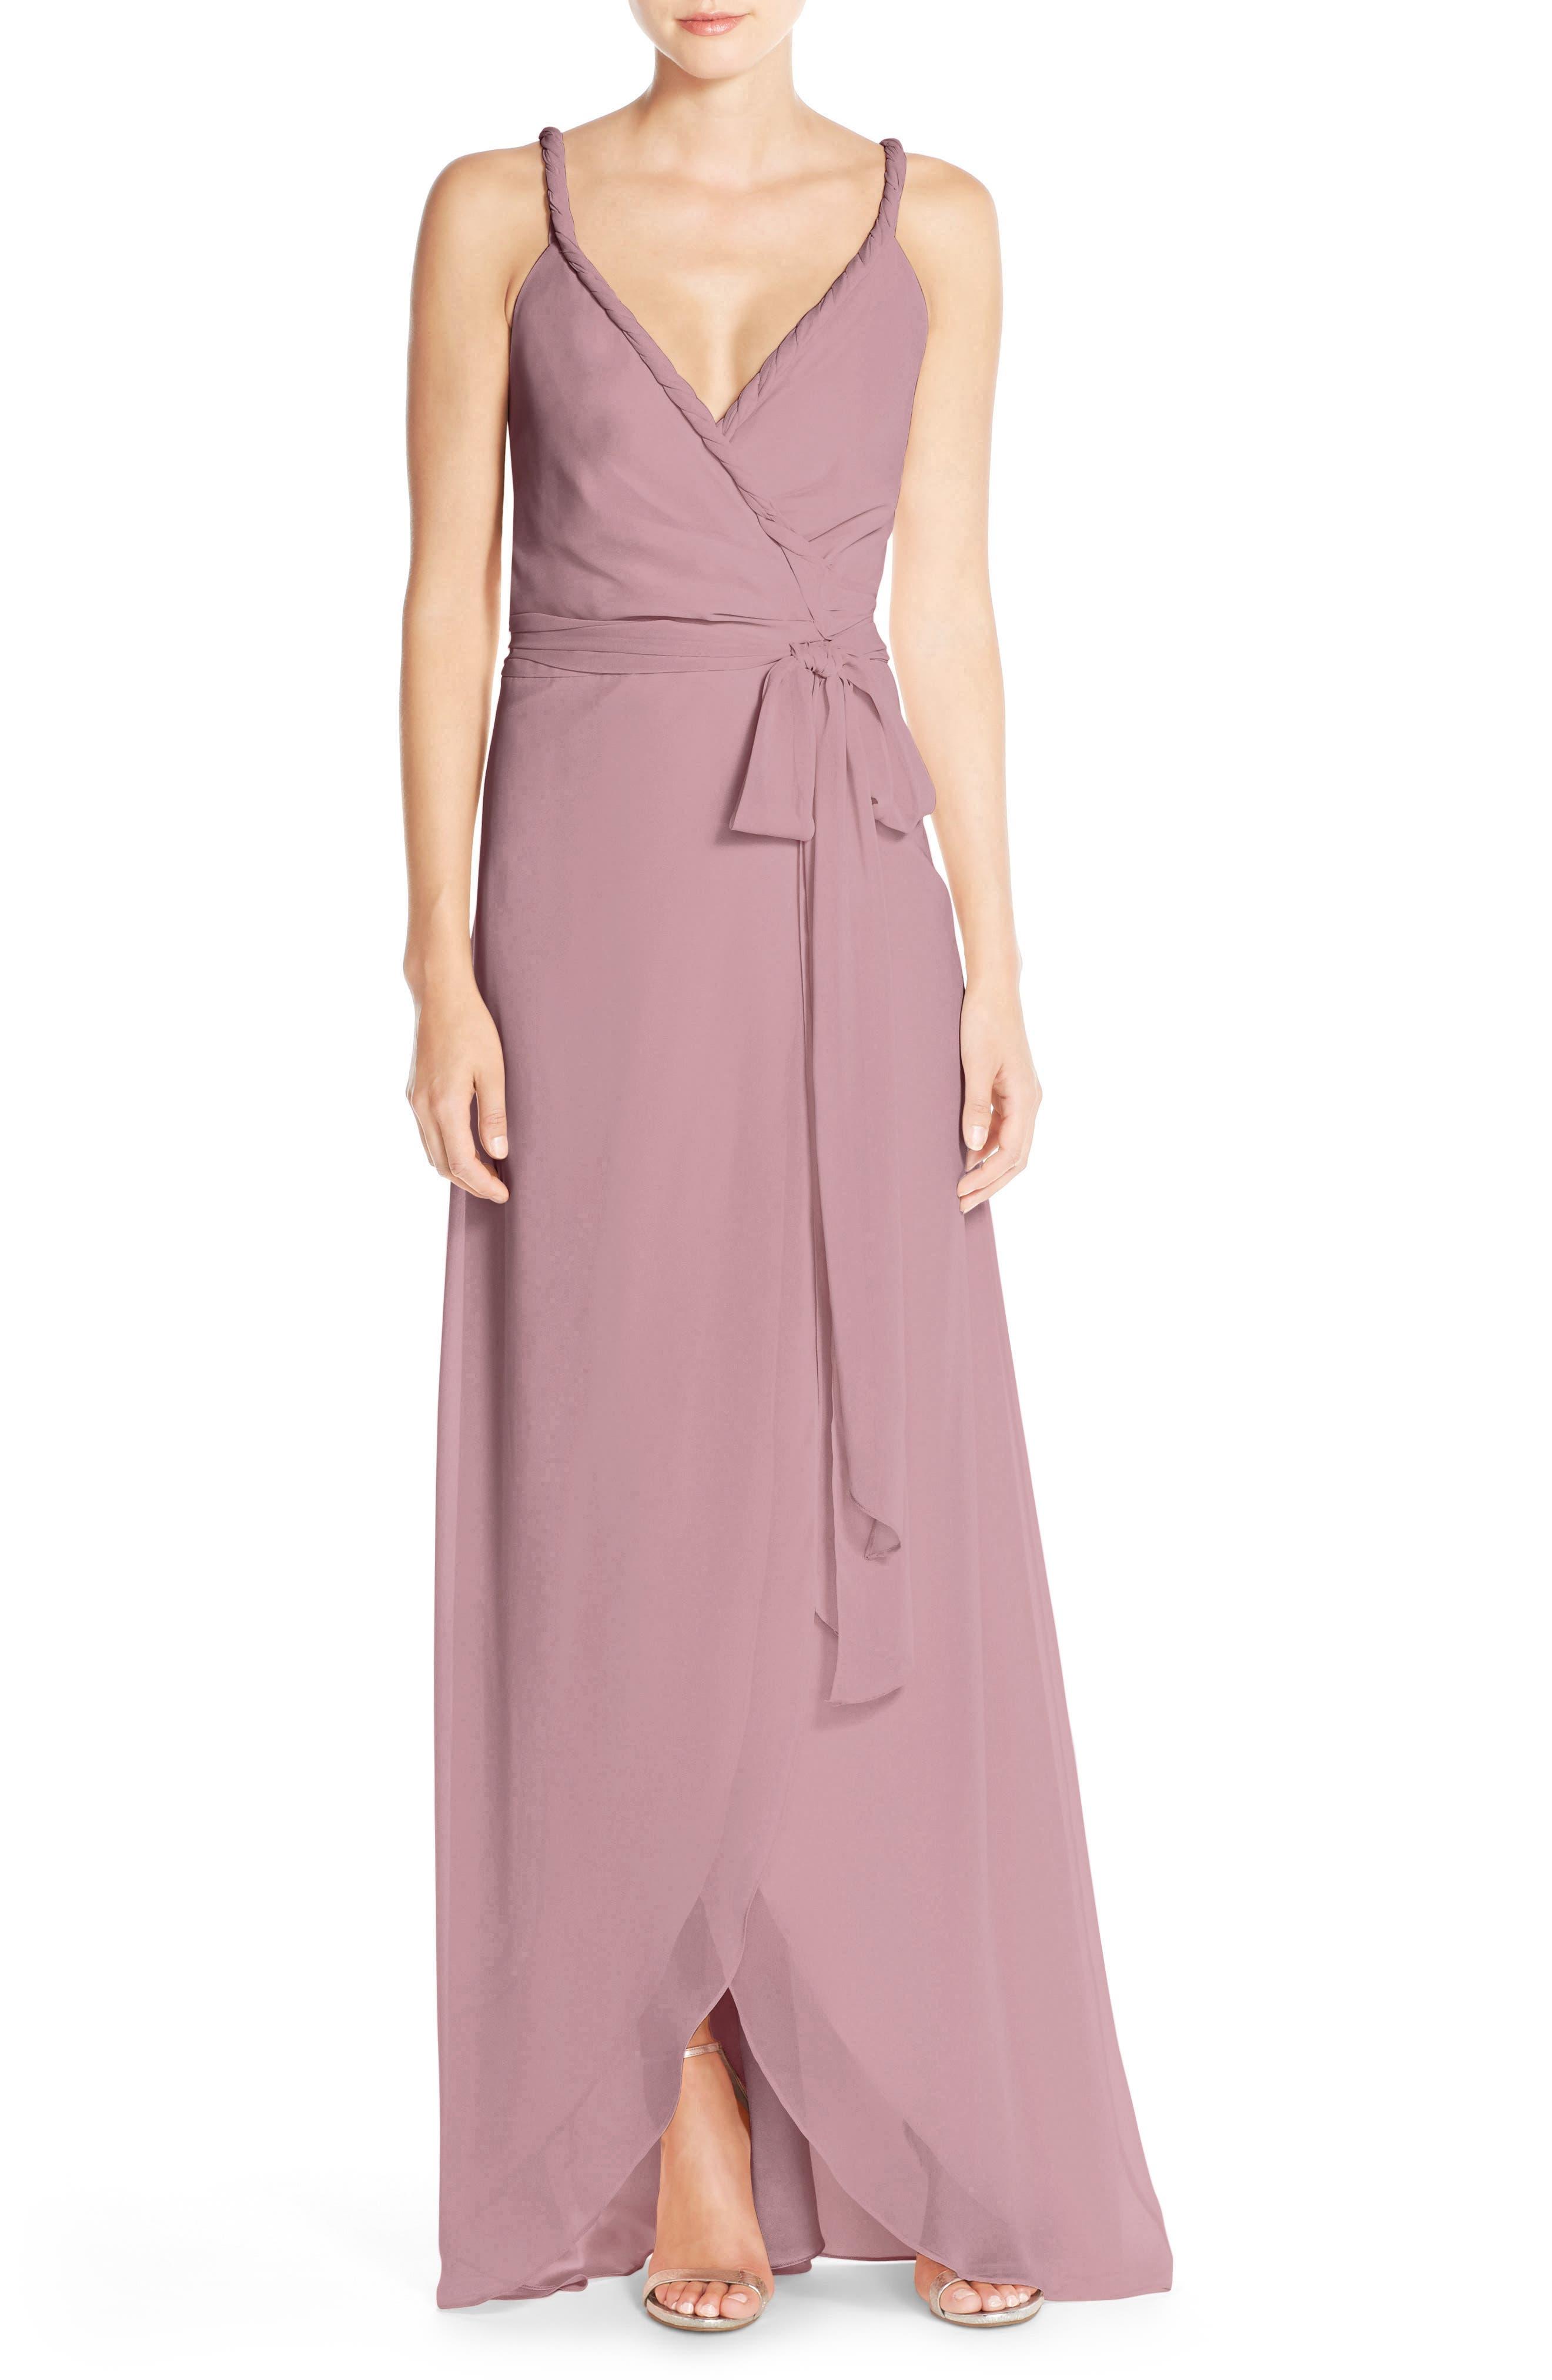 Ceremony by Joanna August 'Parker' Twist Strap ChiffonWrap Gown